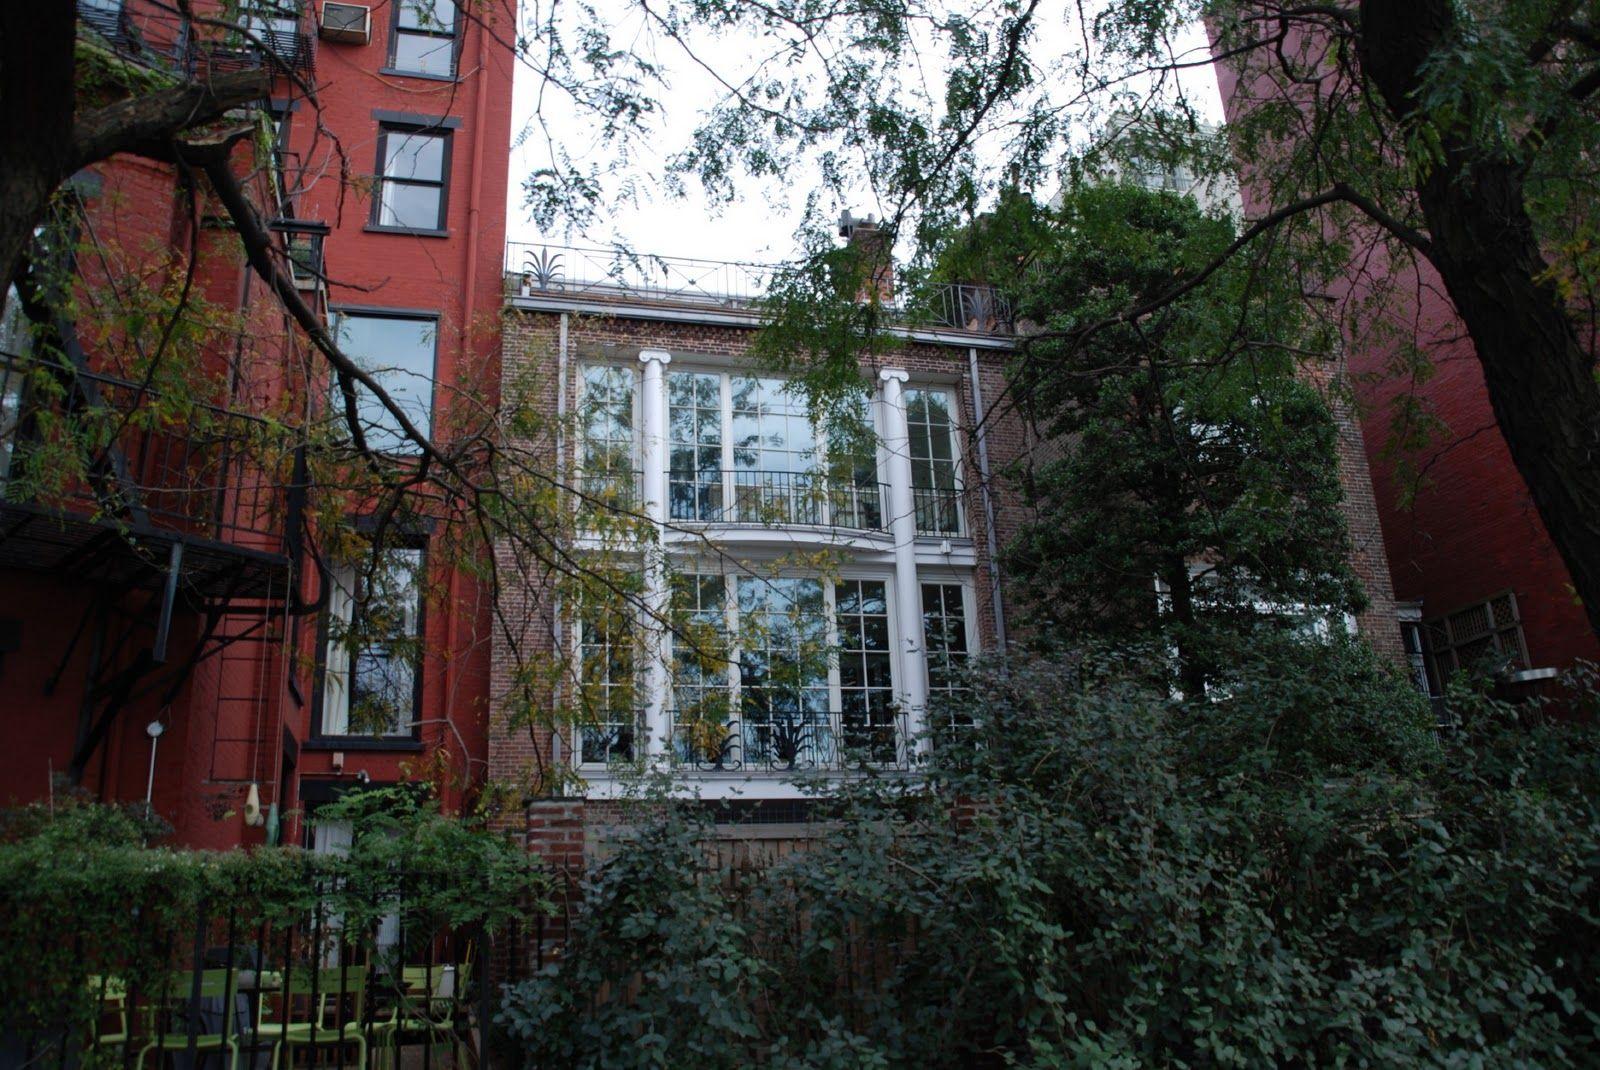 Burdin's family in USA: Brooklyn Heights